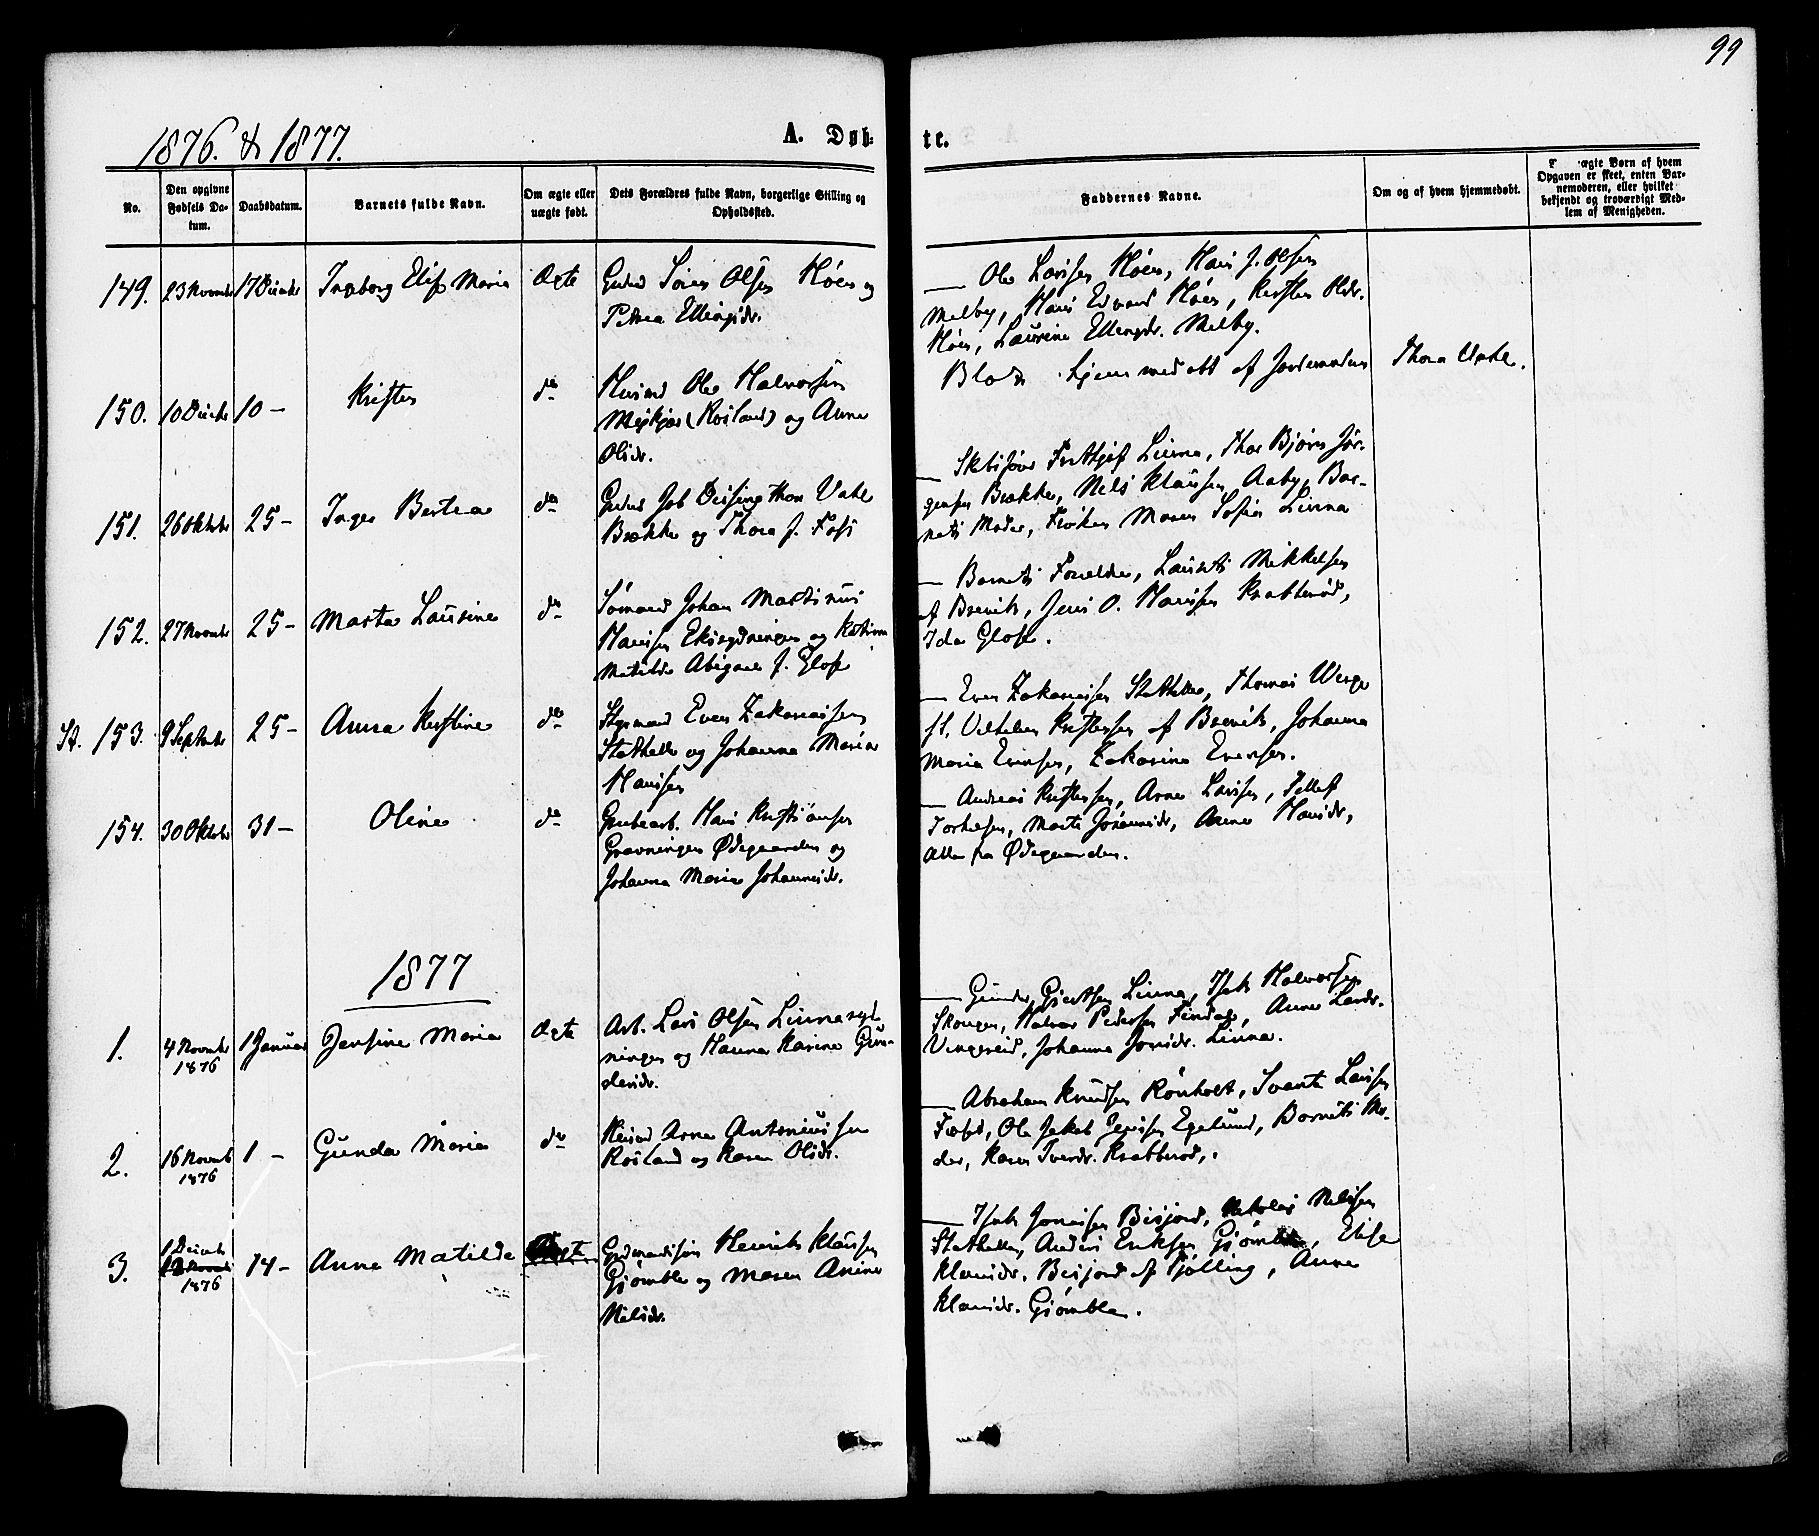 SAKO, Bamble kirkebøker, F/Fa/L0006: Ministerialbok nr. I 6, 1869-1877, s. 99